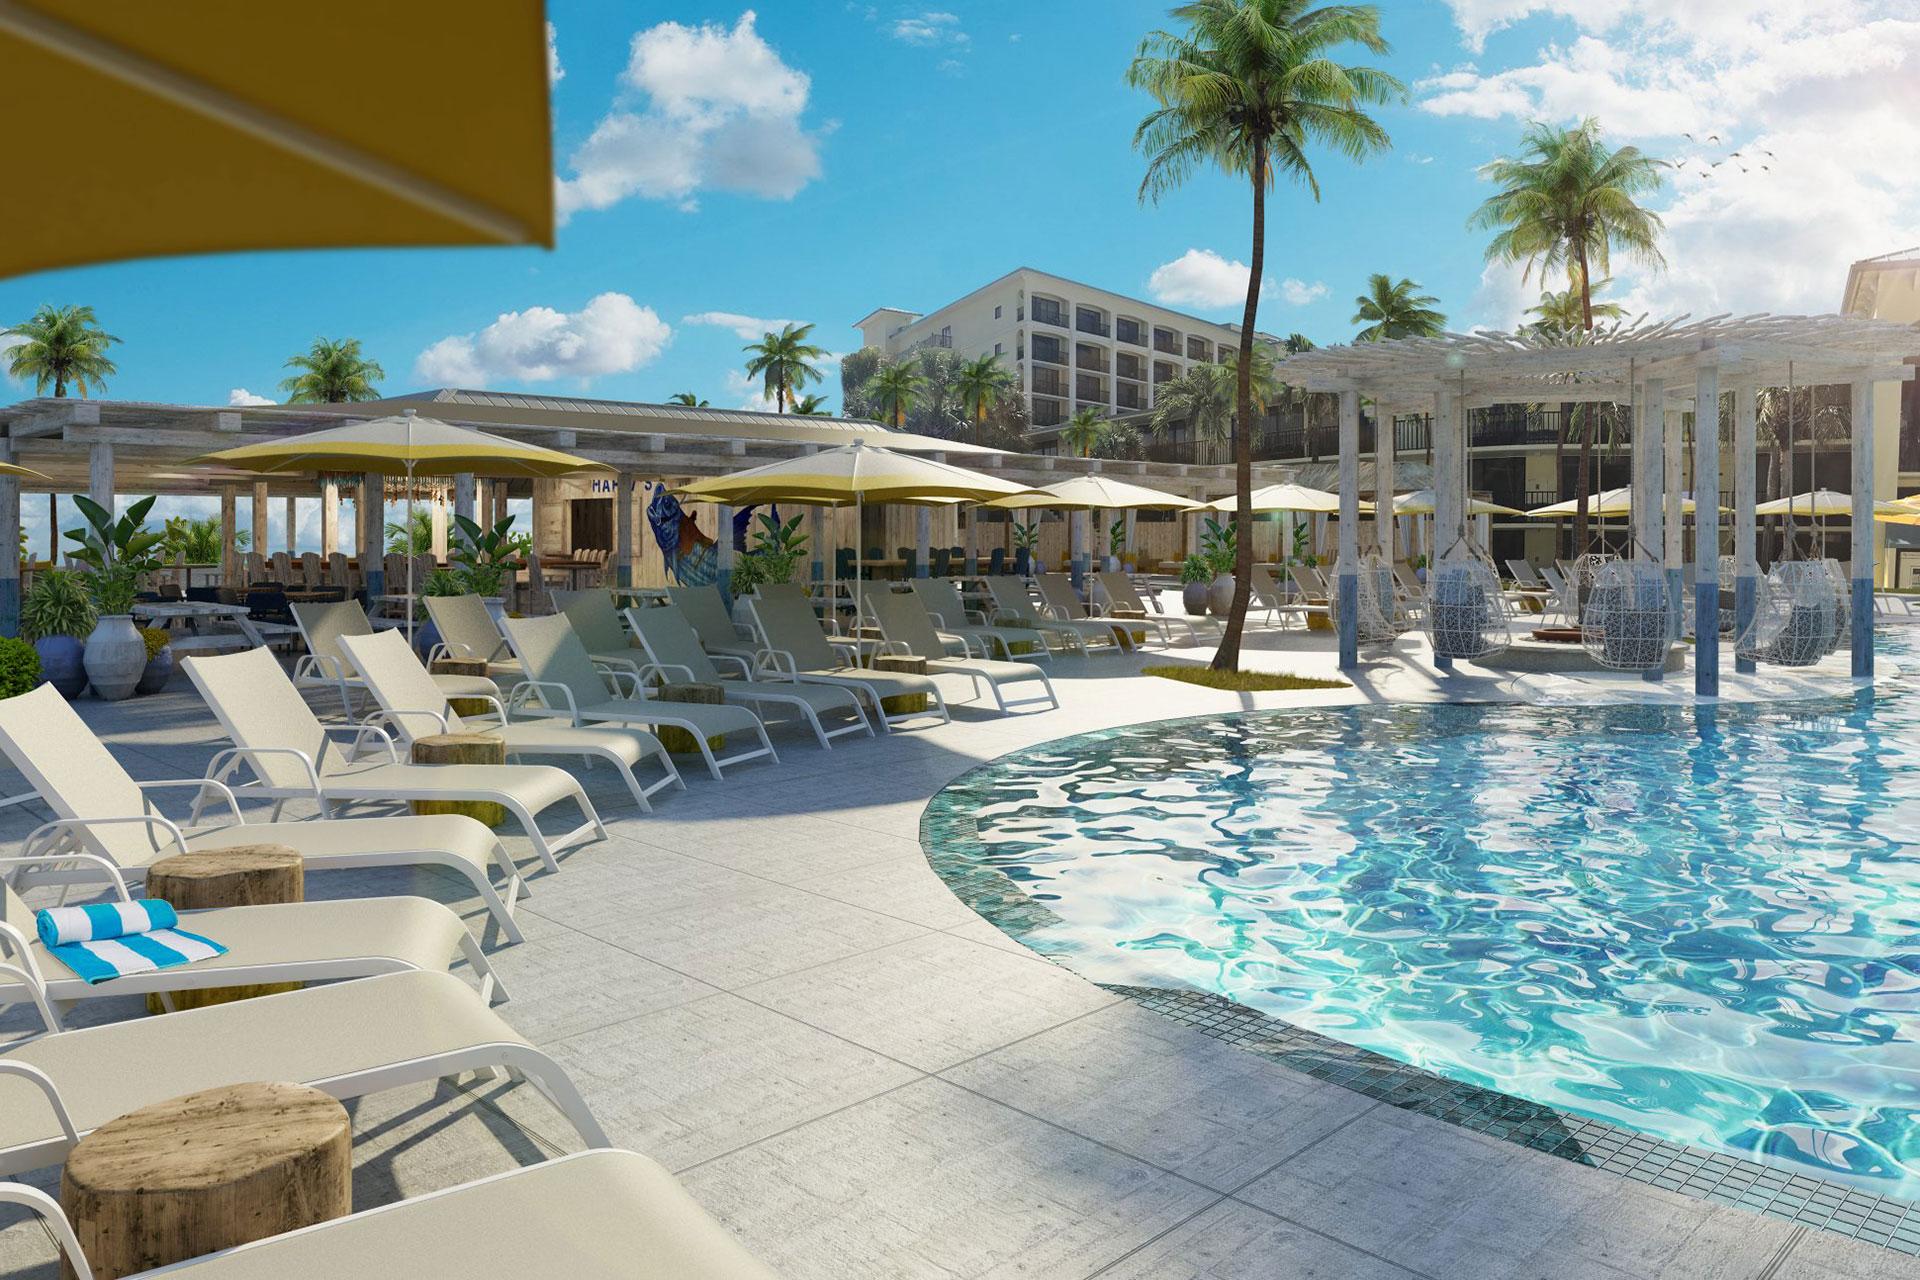 Pool at Sirata Beach Resort; Courtesy of Sirata Beach Resort